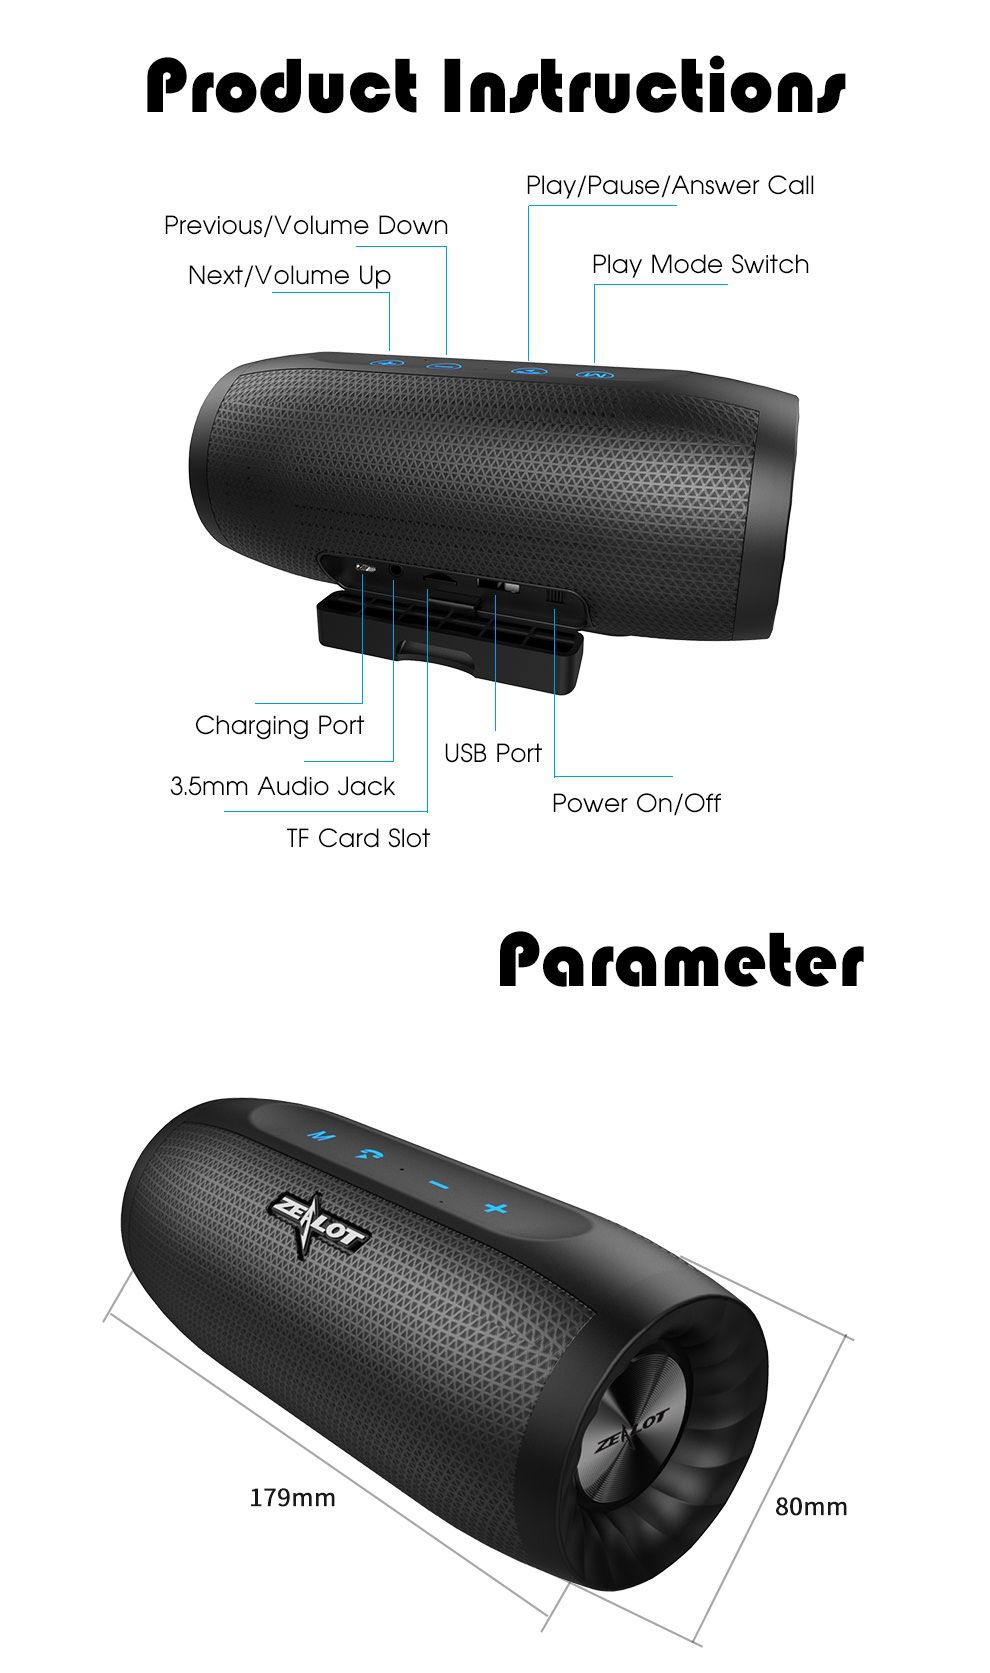 2a478e03ec23ef ZEALOT S16 HiFi Portable Bluetooth Speaker Dual Units 4000mAh Outdoors  Waterproof TF Card Soundbar